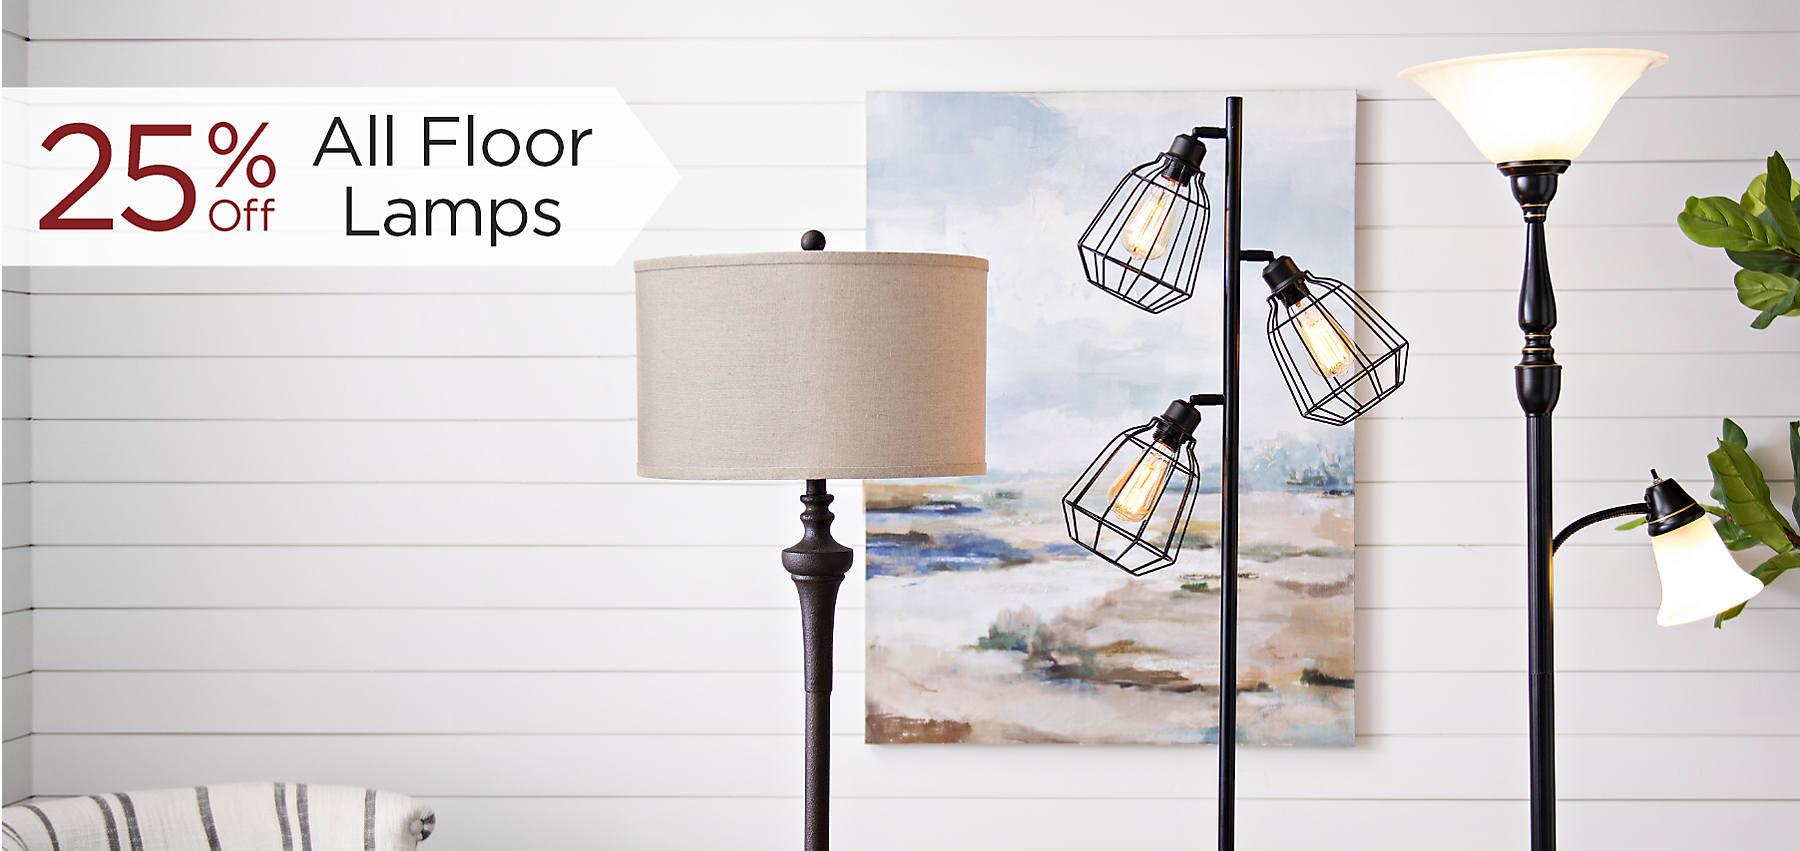 25% Off All Floor Lamps